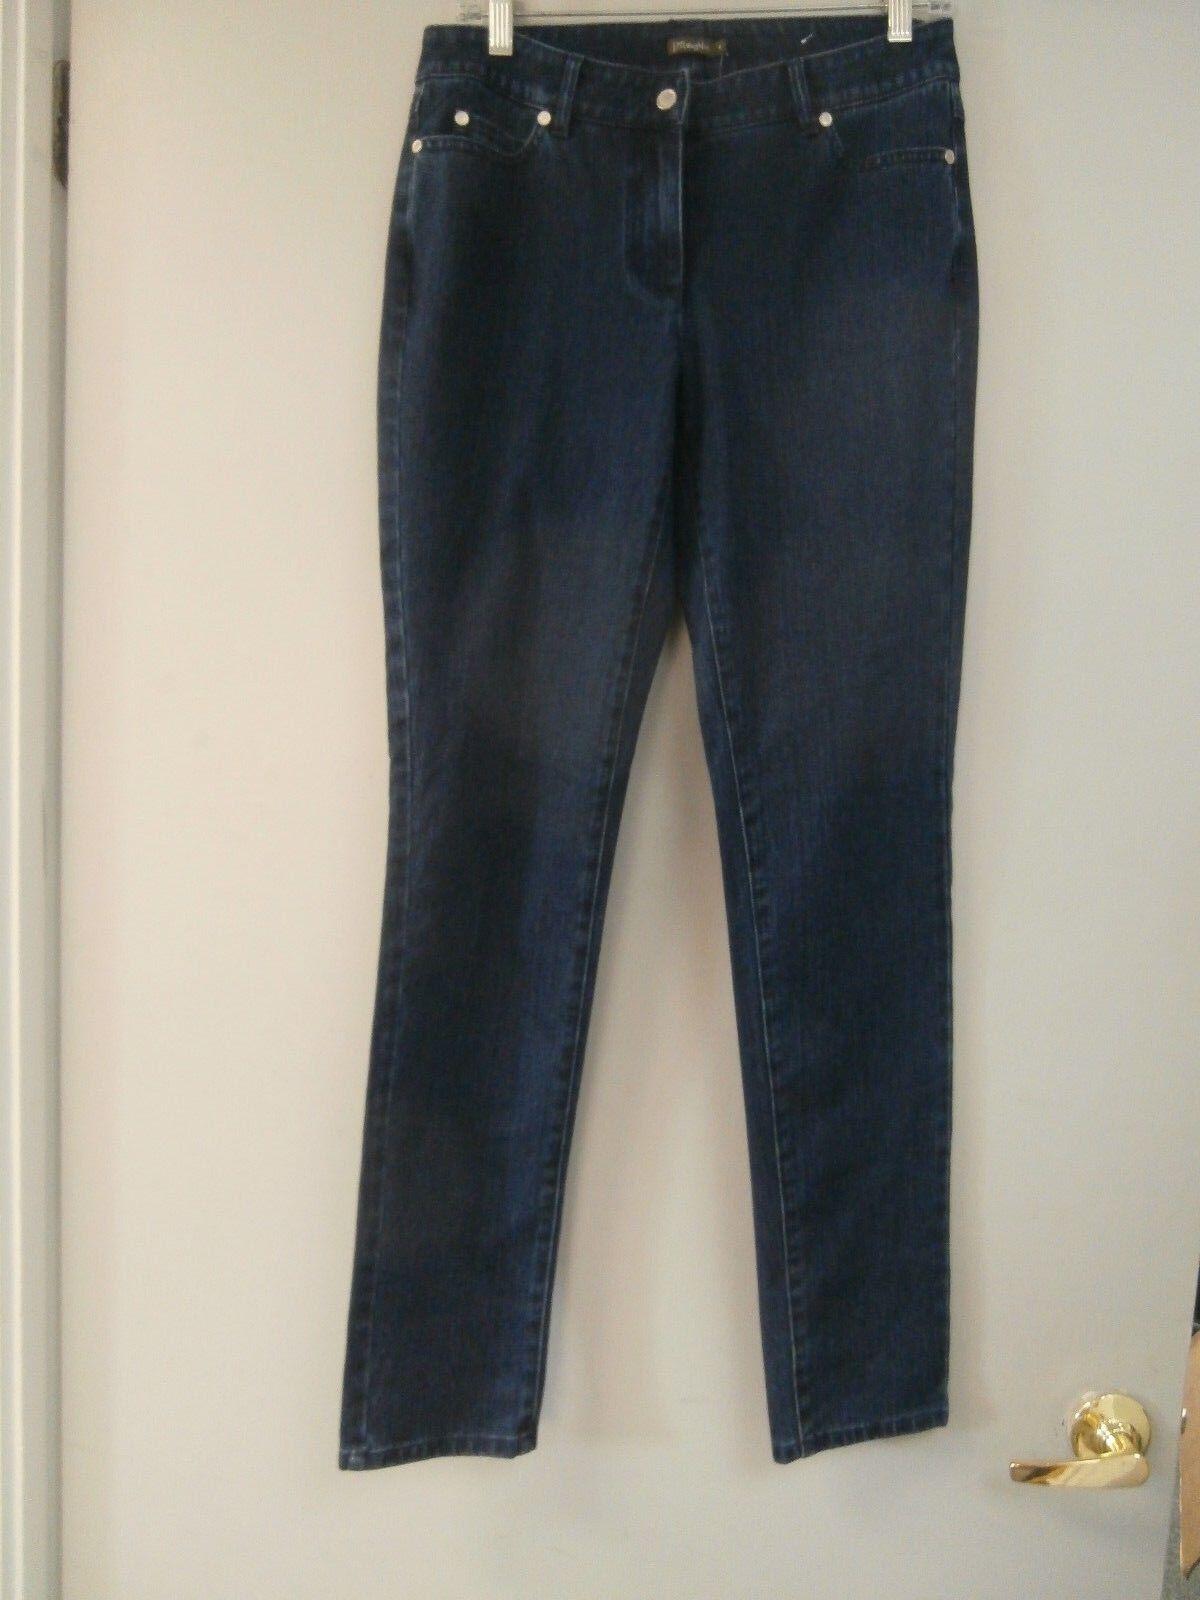 J. Mclaughlin Women's  Denim Jeans Size 4 New